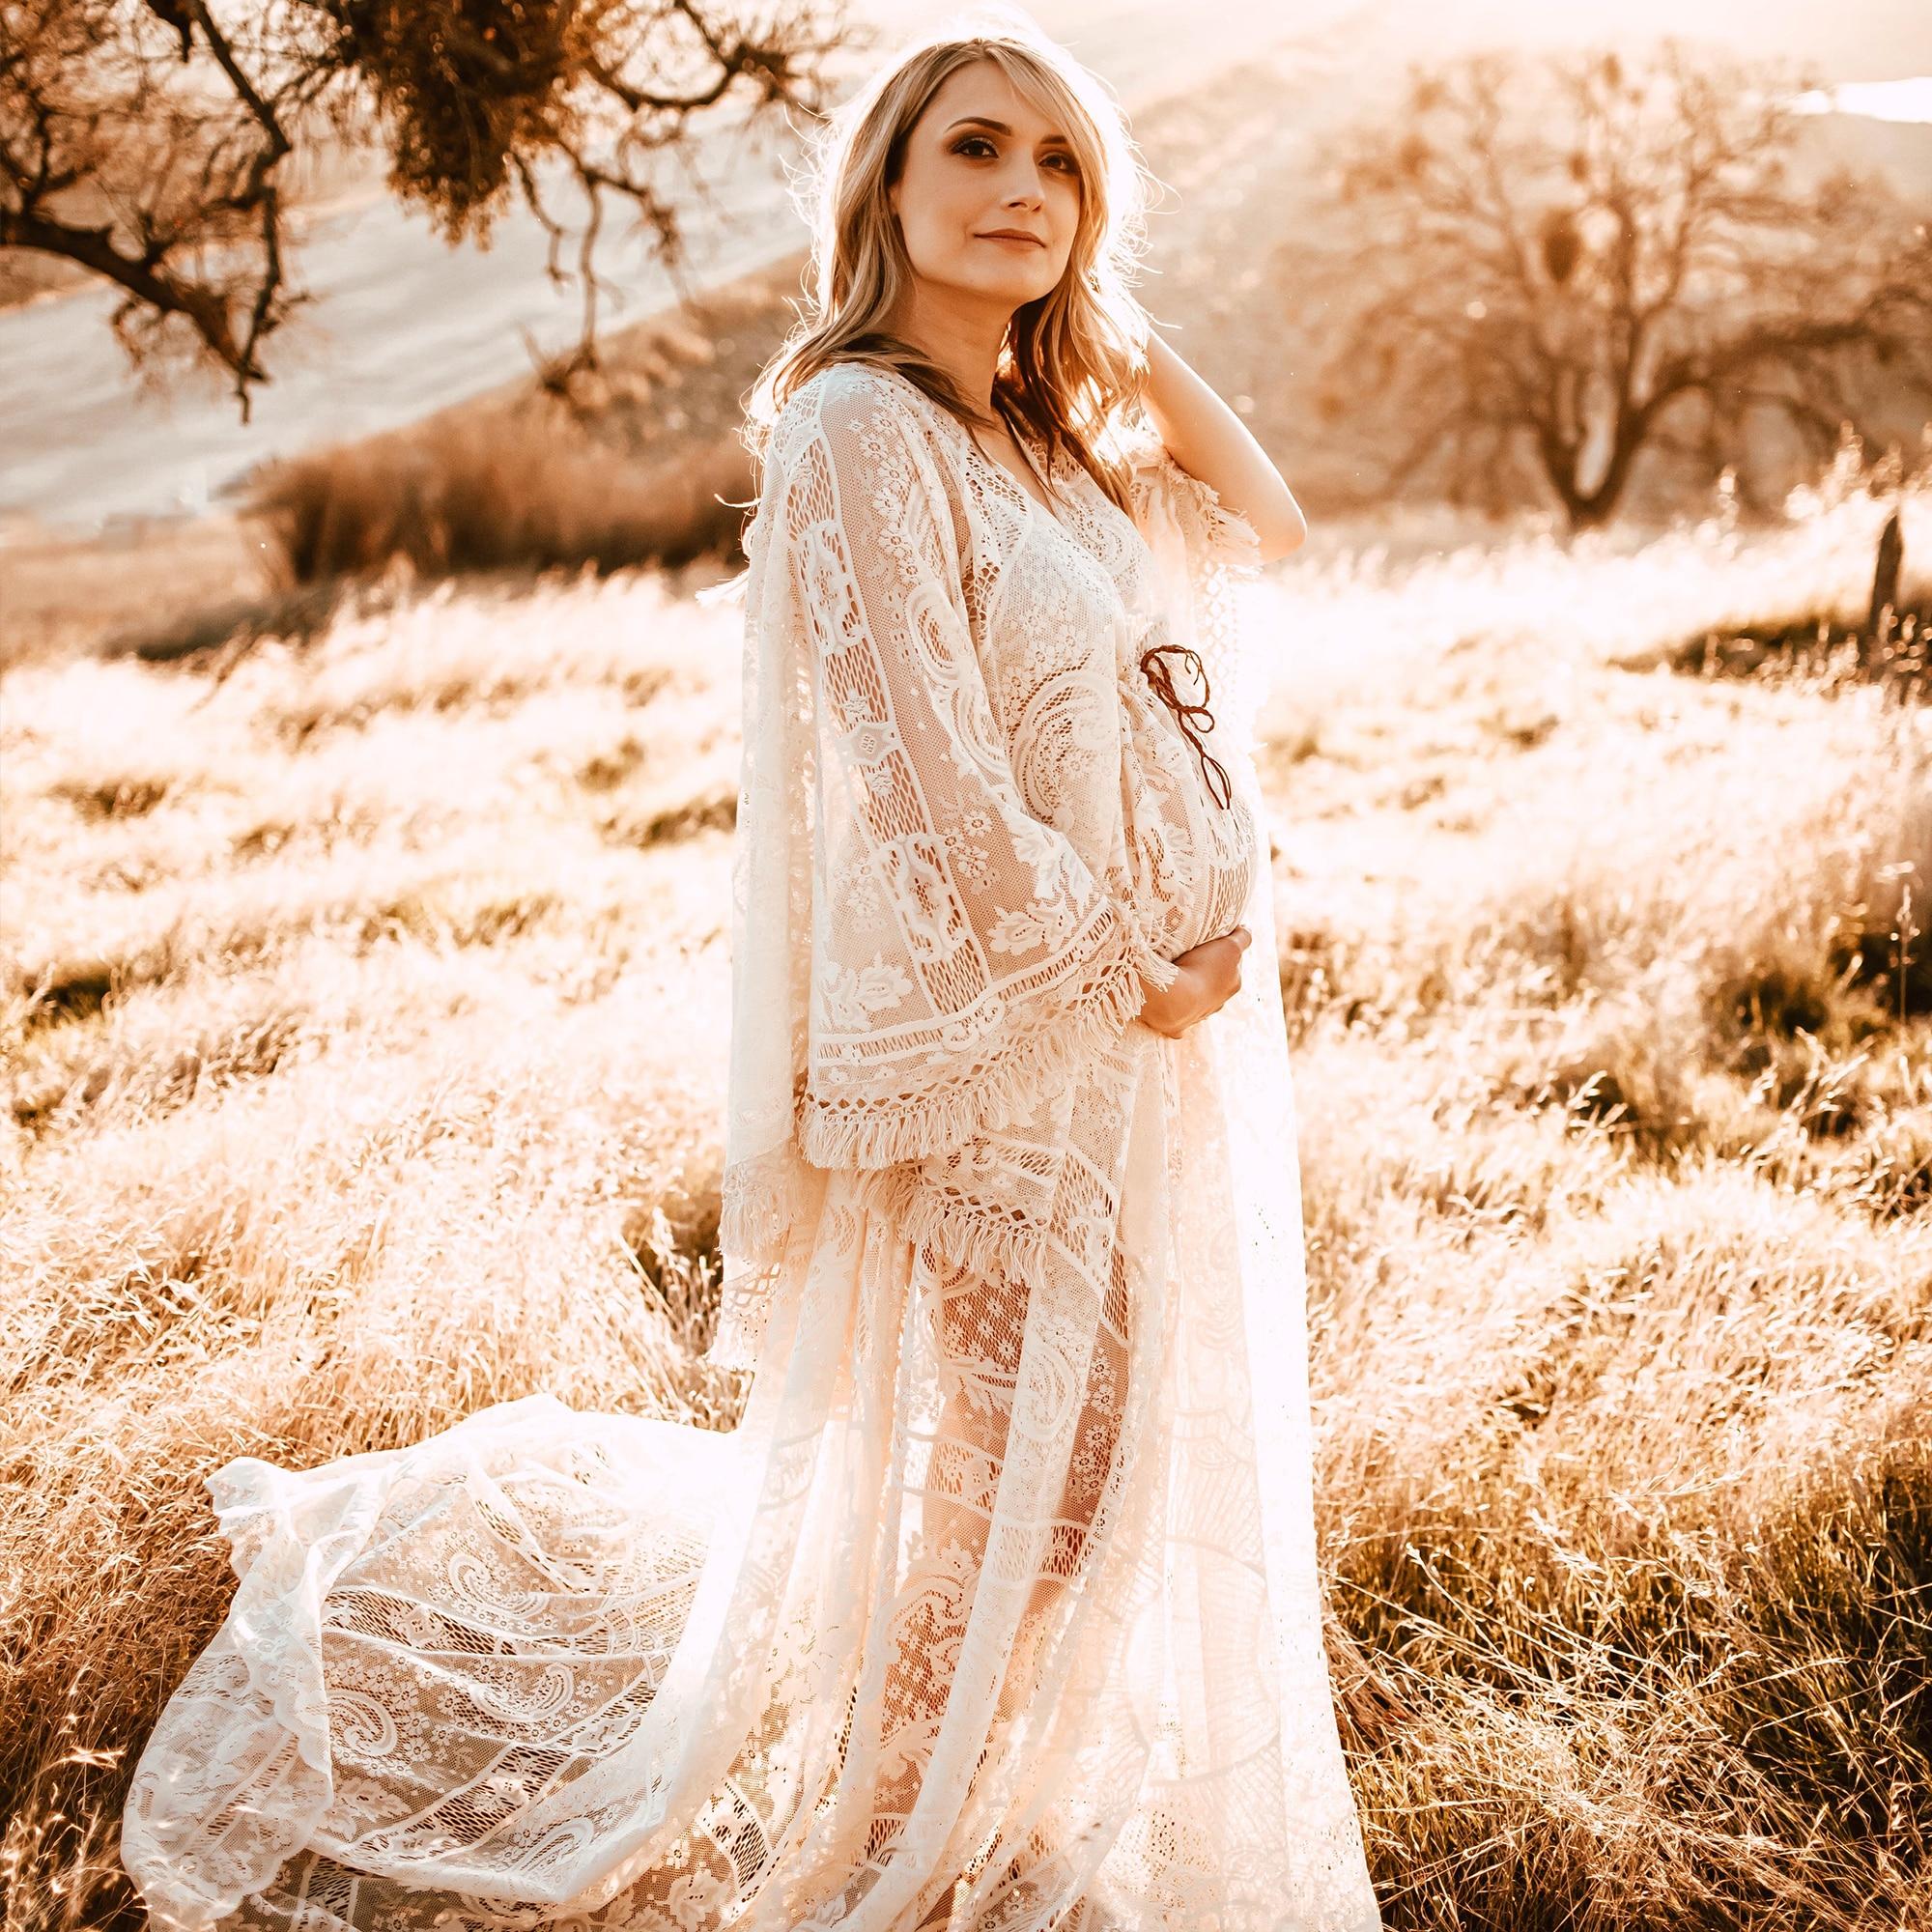 Don&Judy Maternity or Non-Maternity Dress Bohemia Boho Bell Sleeves Lace Kaftan Party Evening Dresses Photography Photo Shoot enlarge